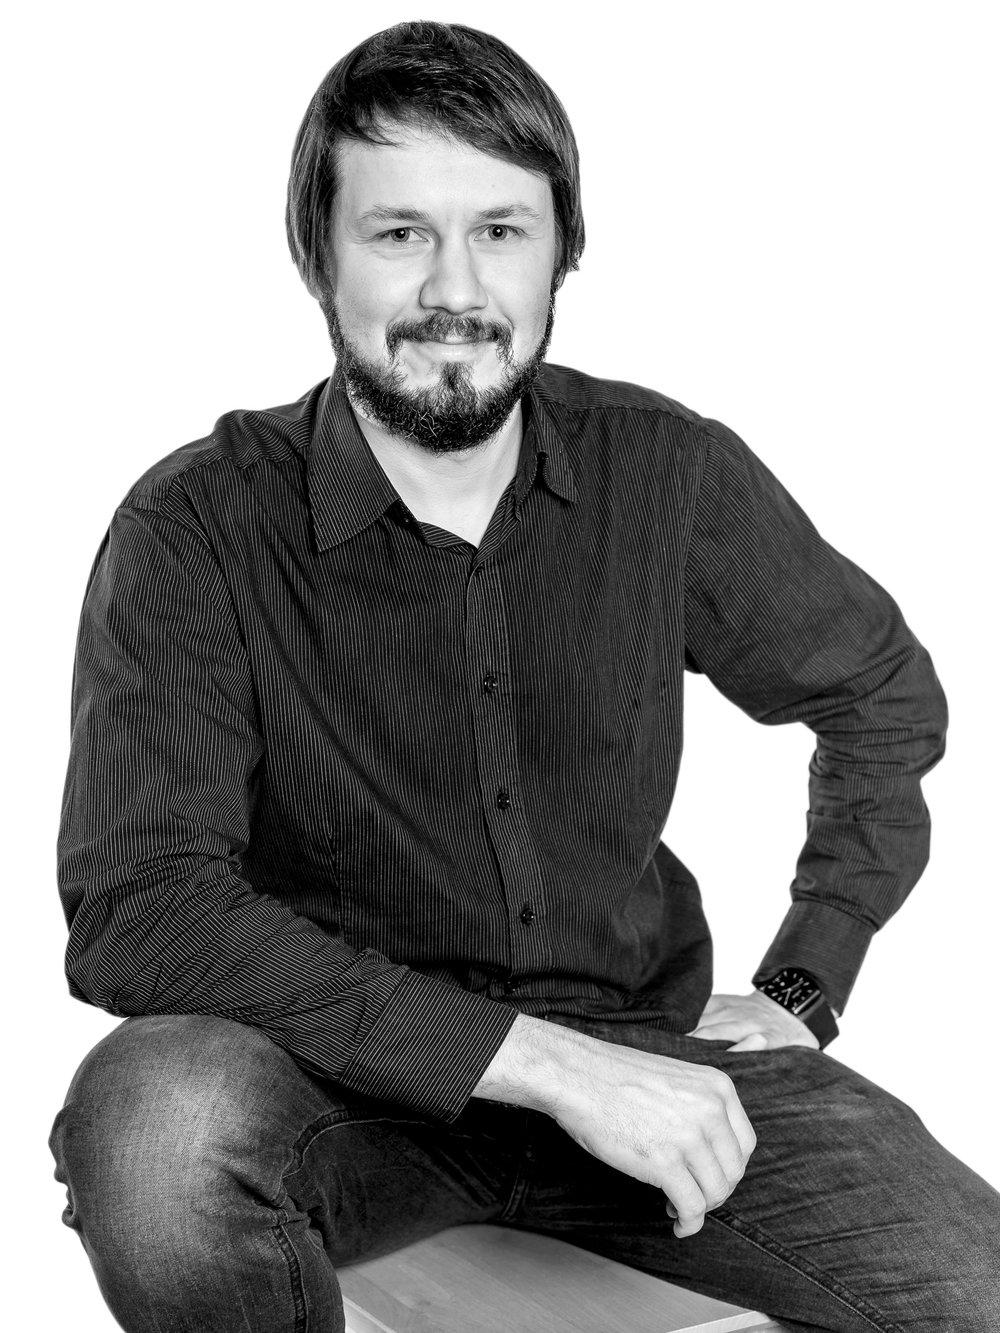 Kristjan Männigo - Architectkristjan.mannigo@ars.ee